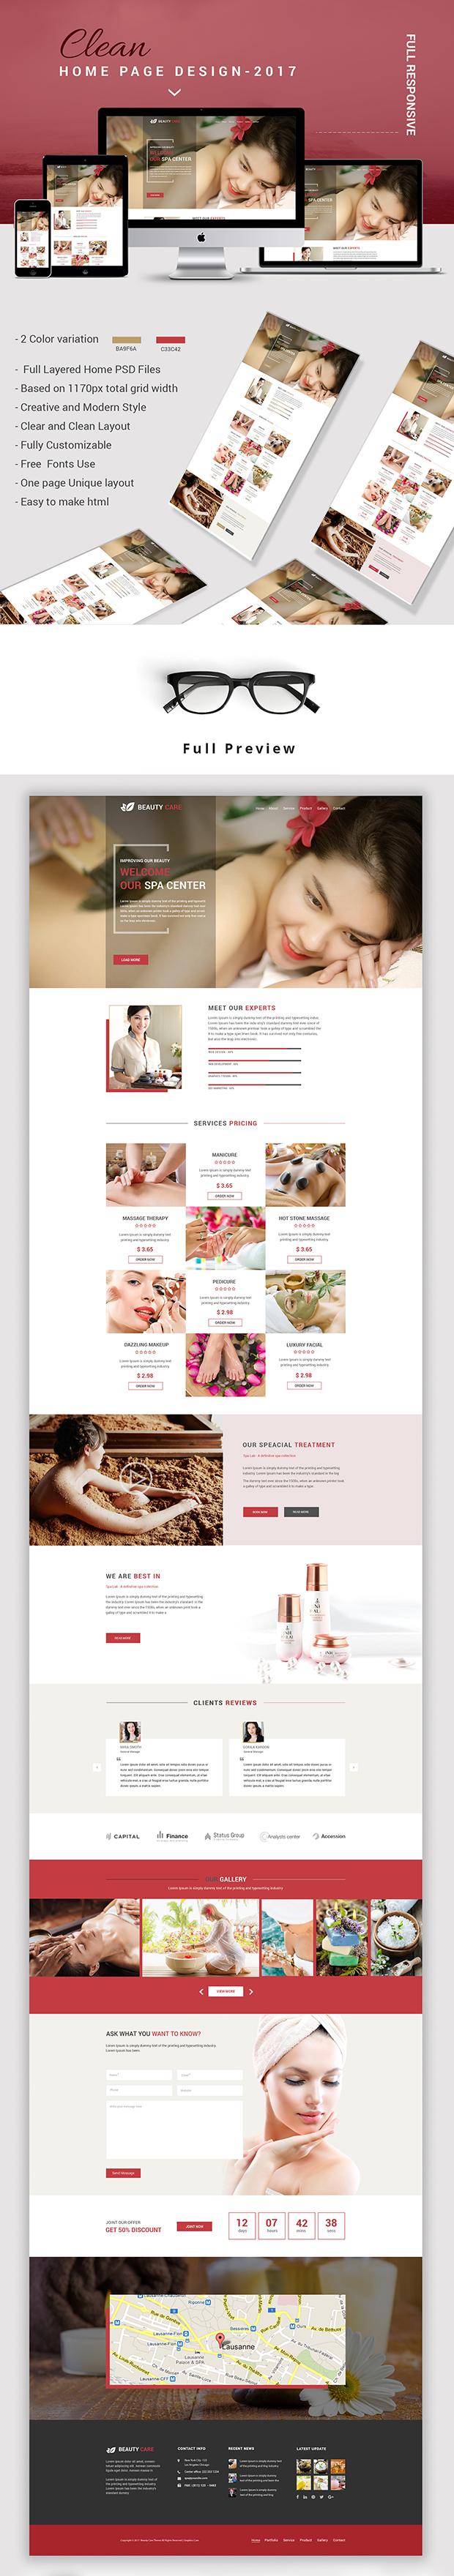 Spa Care - Spa, Salon, Beauty PSD Template - 1